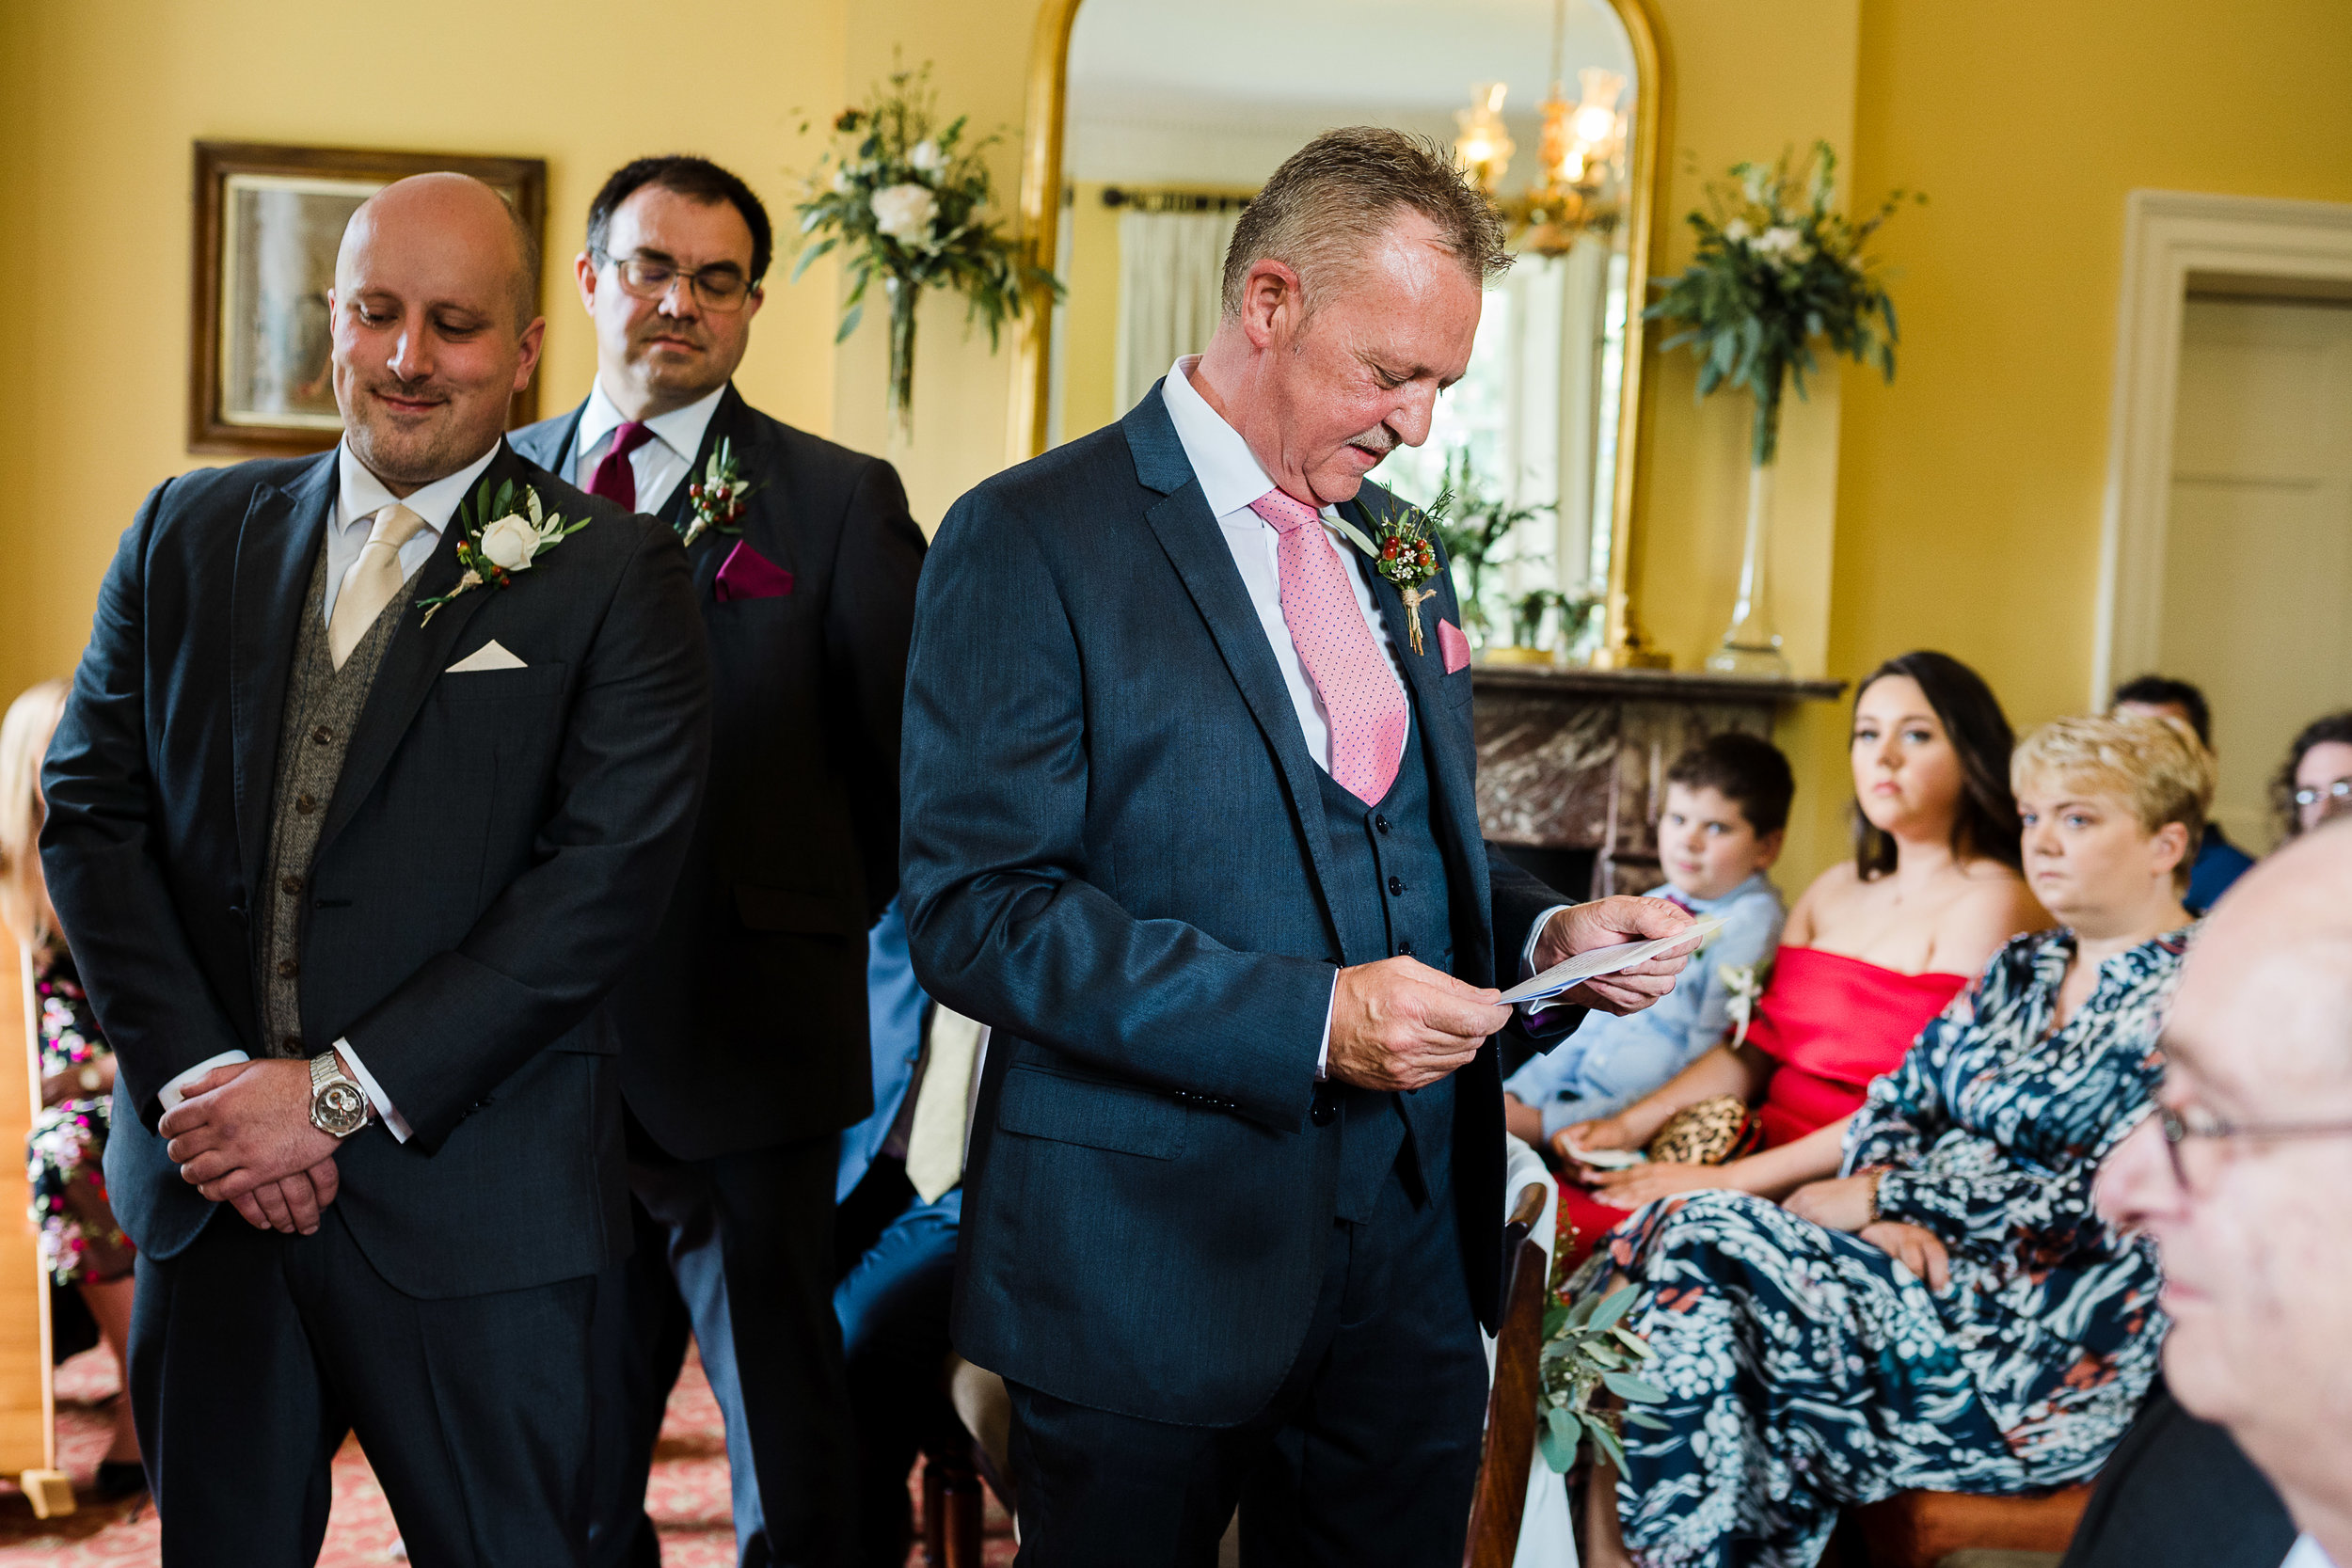 NI Wedding Photographer (50).jpg